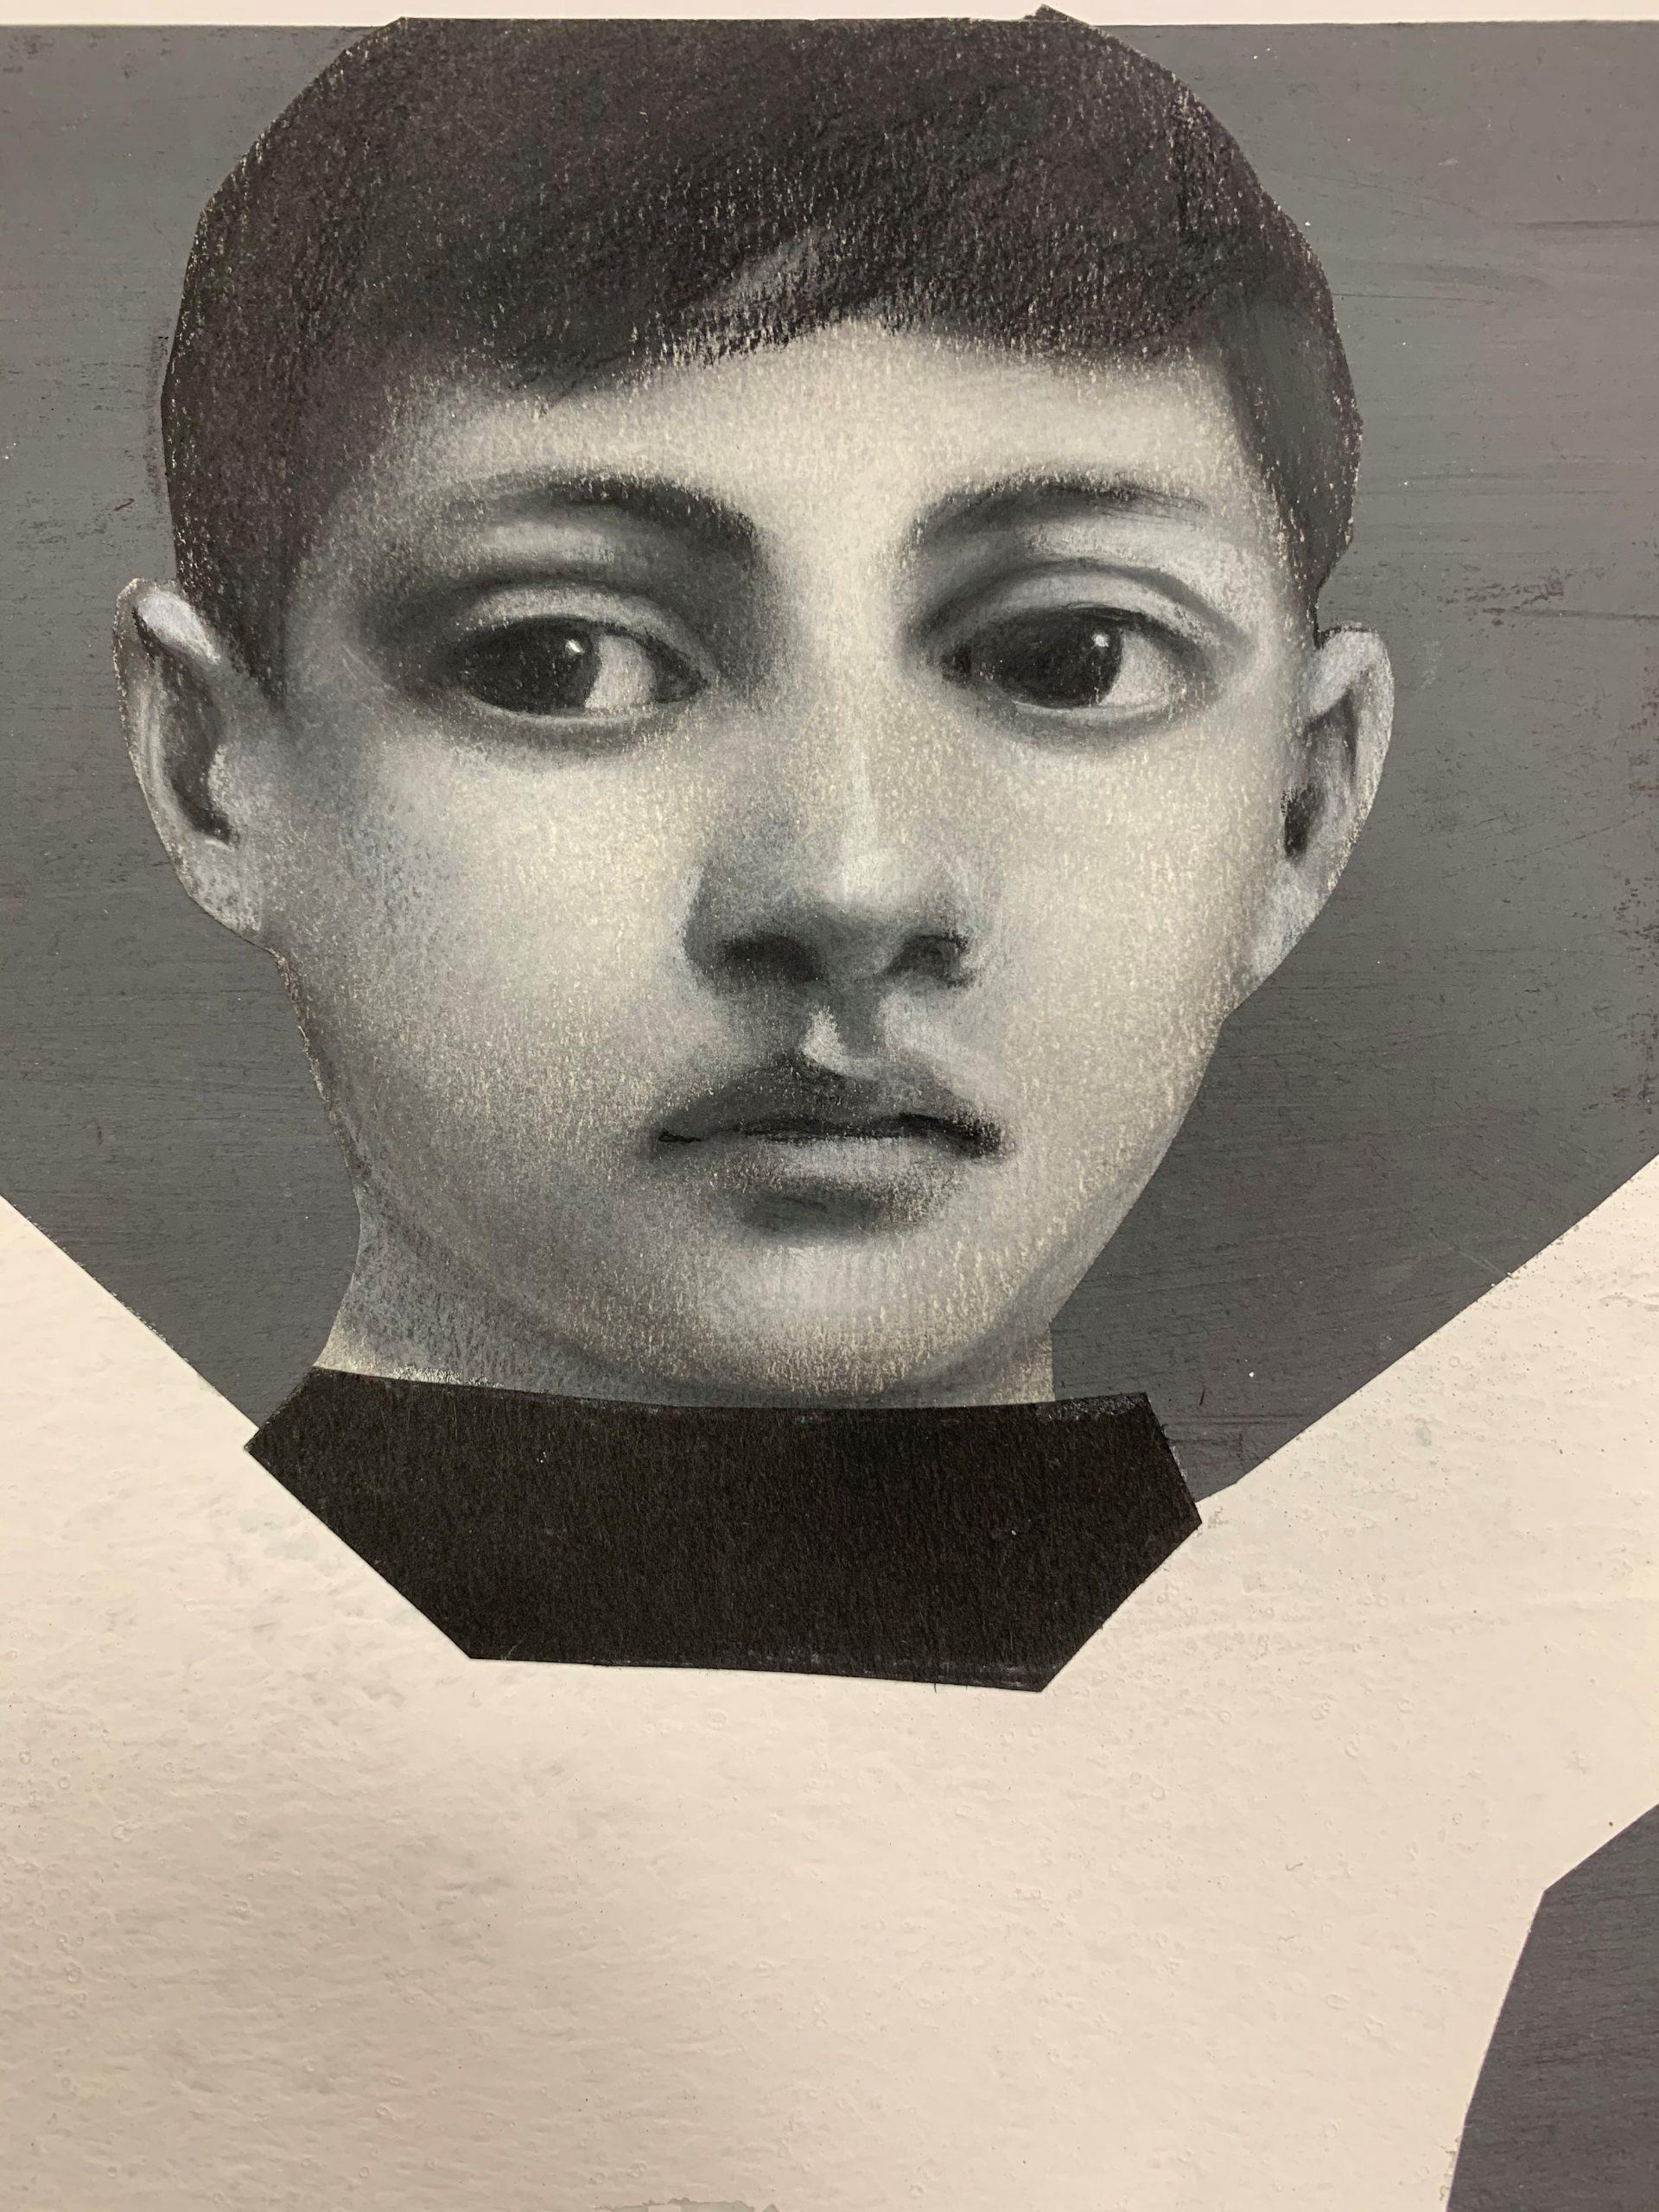 PÑ024 Saudade I 21 x 21 cm lápiz sobre cartón 2020